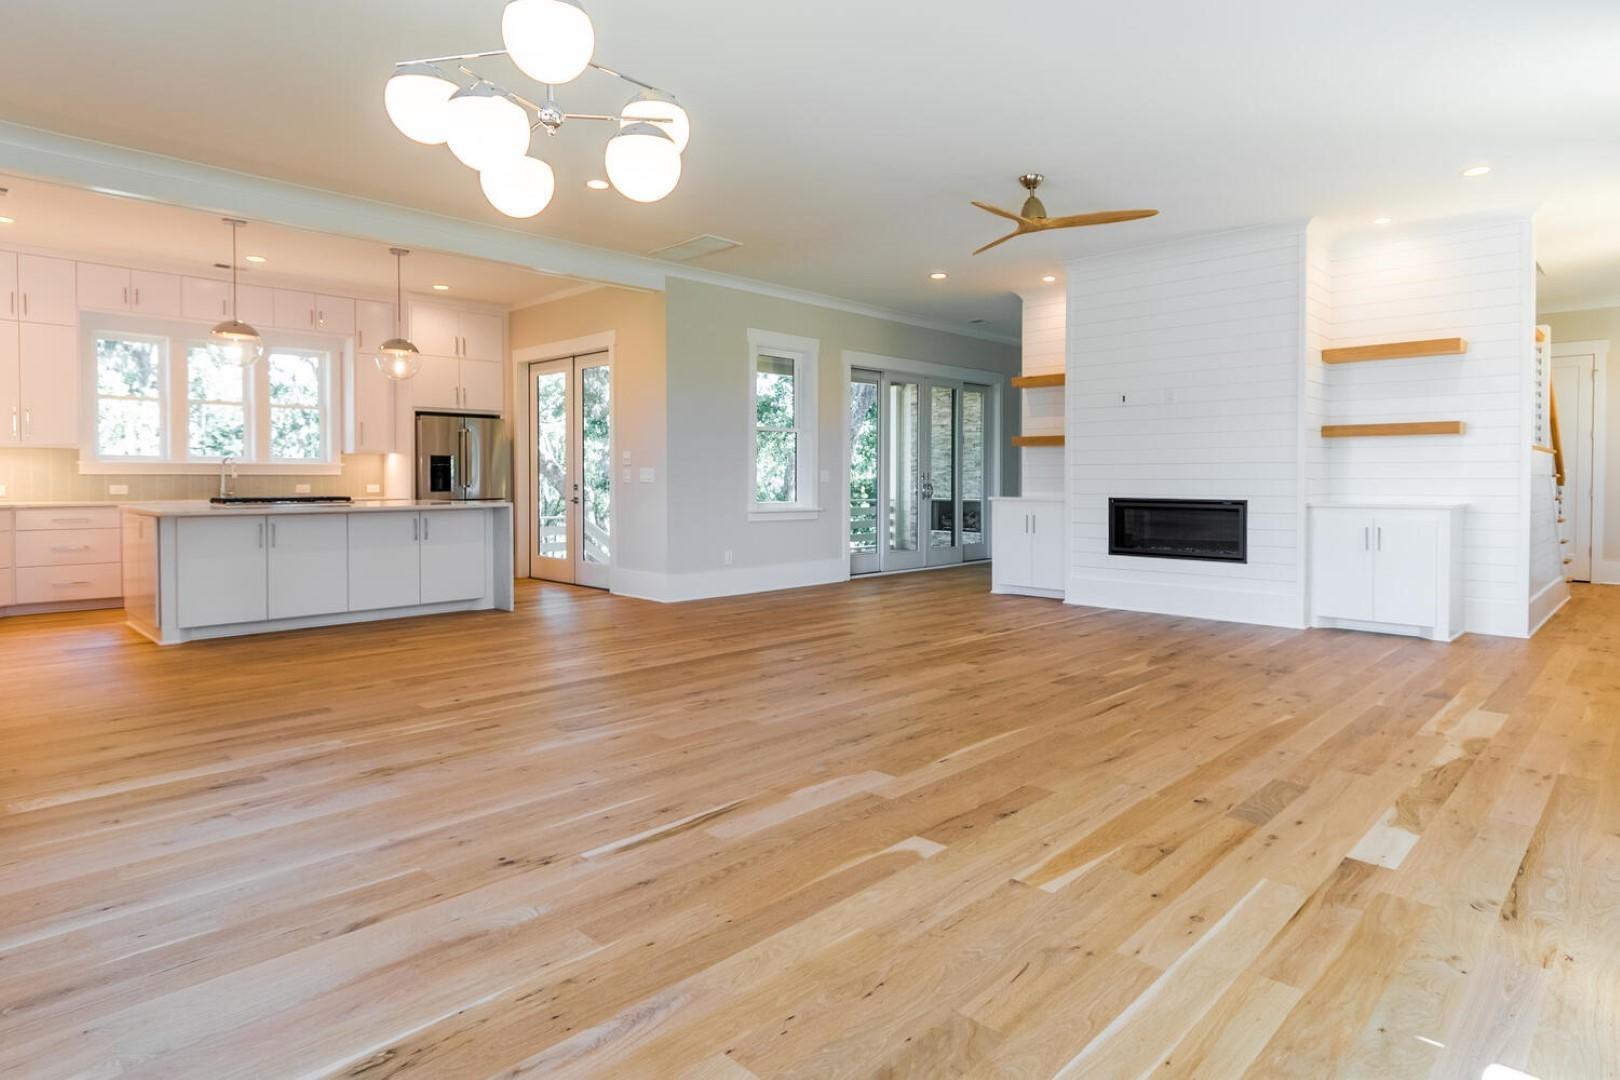 Scanlonville Homes For Sale - 156 5th, Mount Pleasant, SC - 17